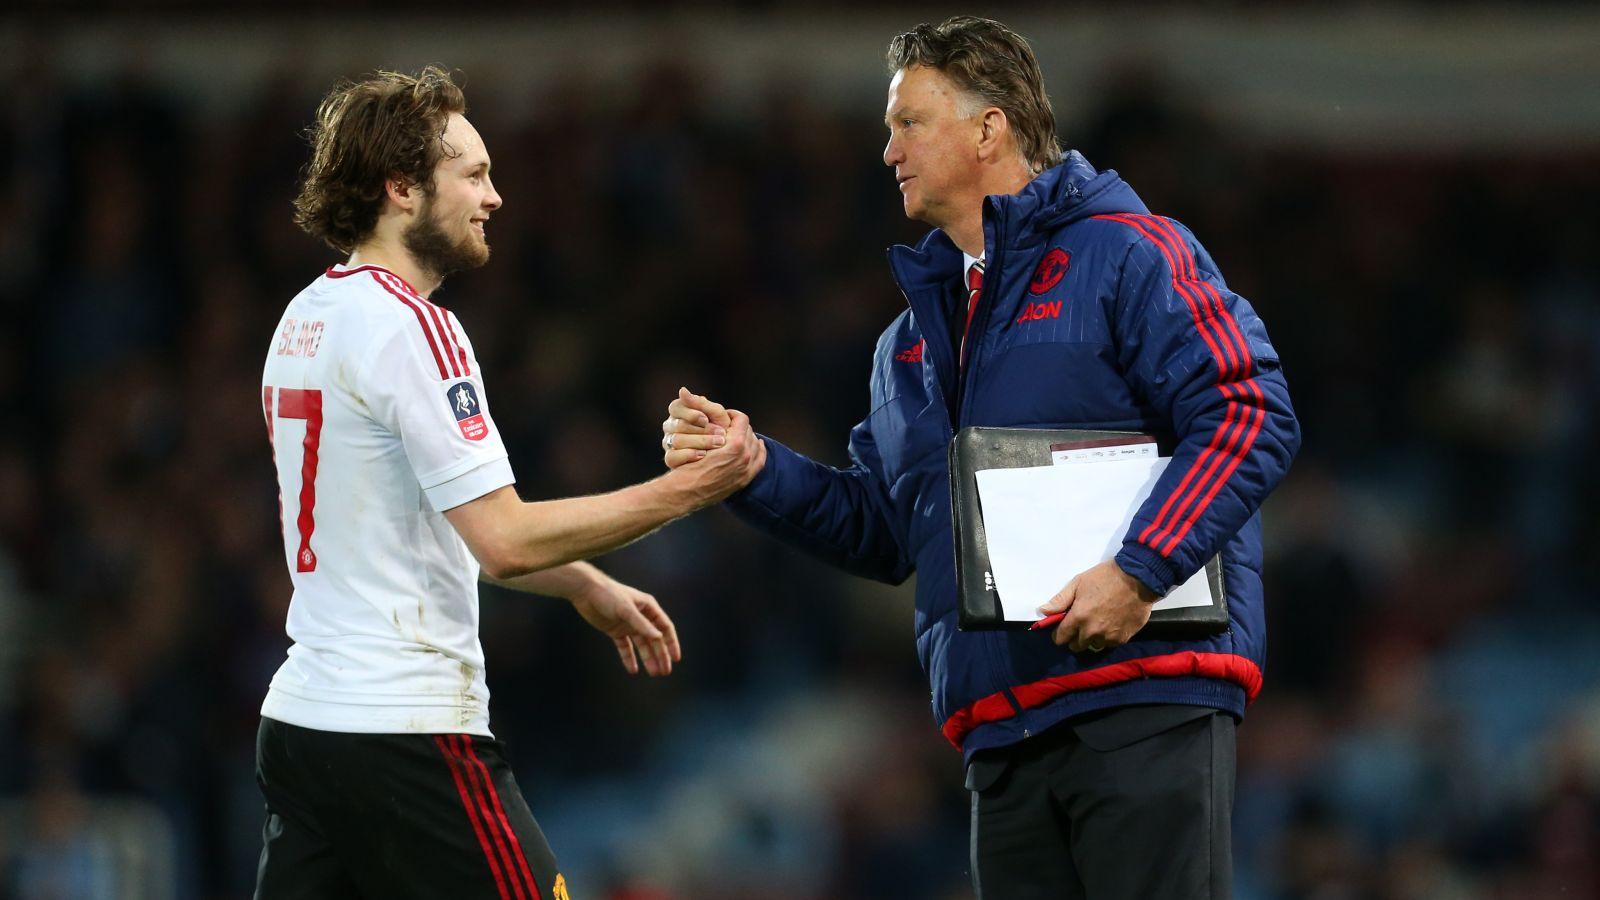 Van Gaal deserved more time as United boss, says Blind